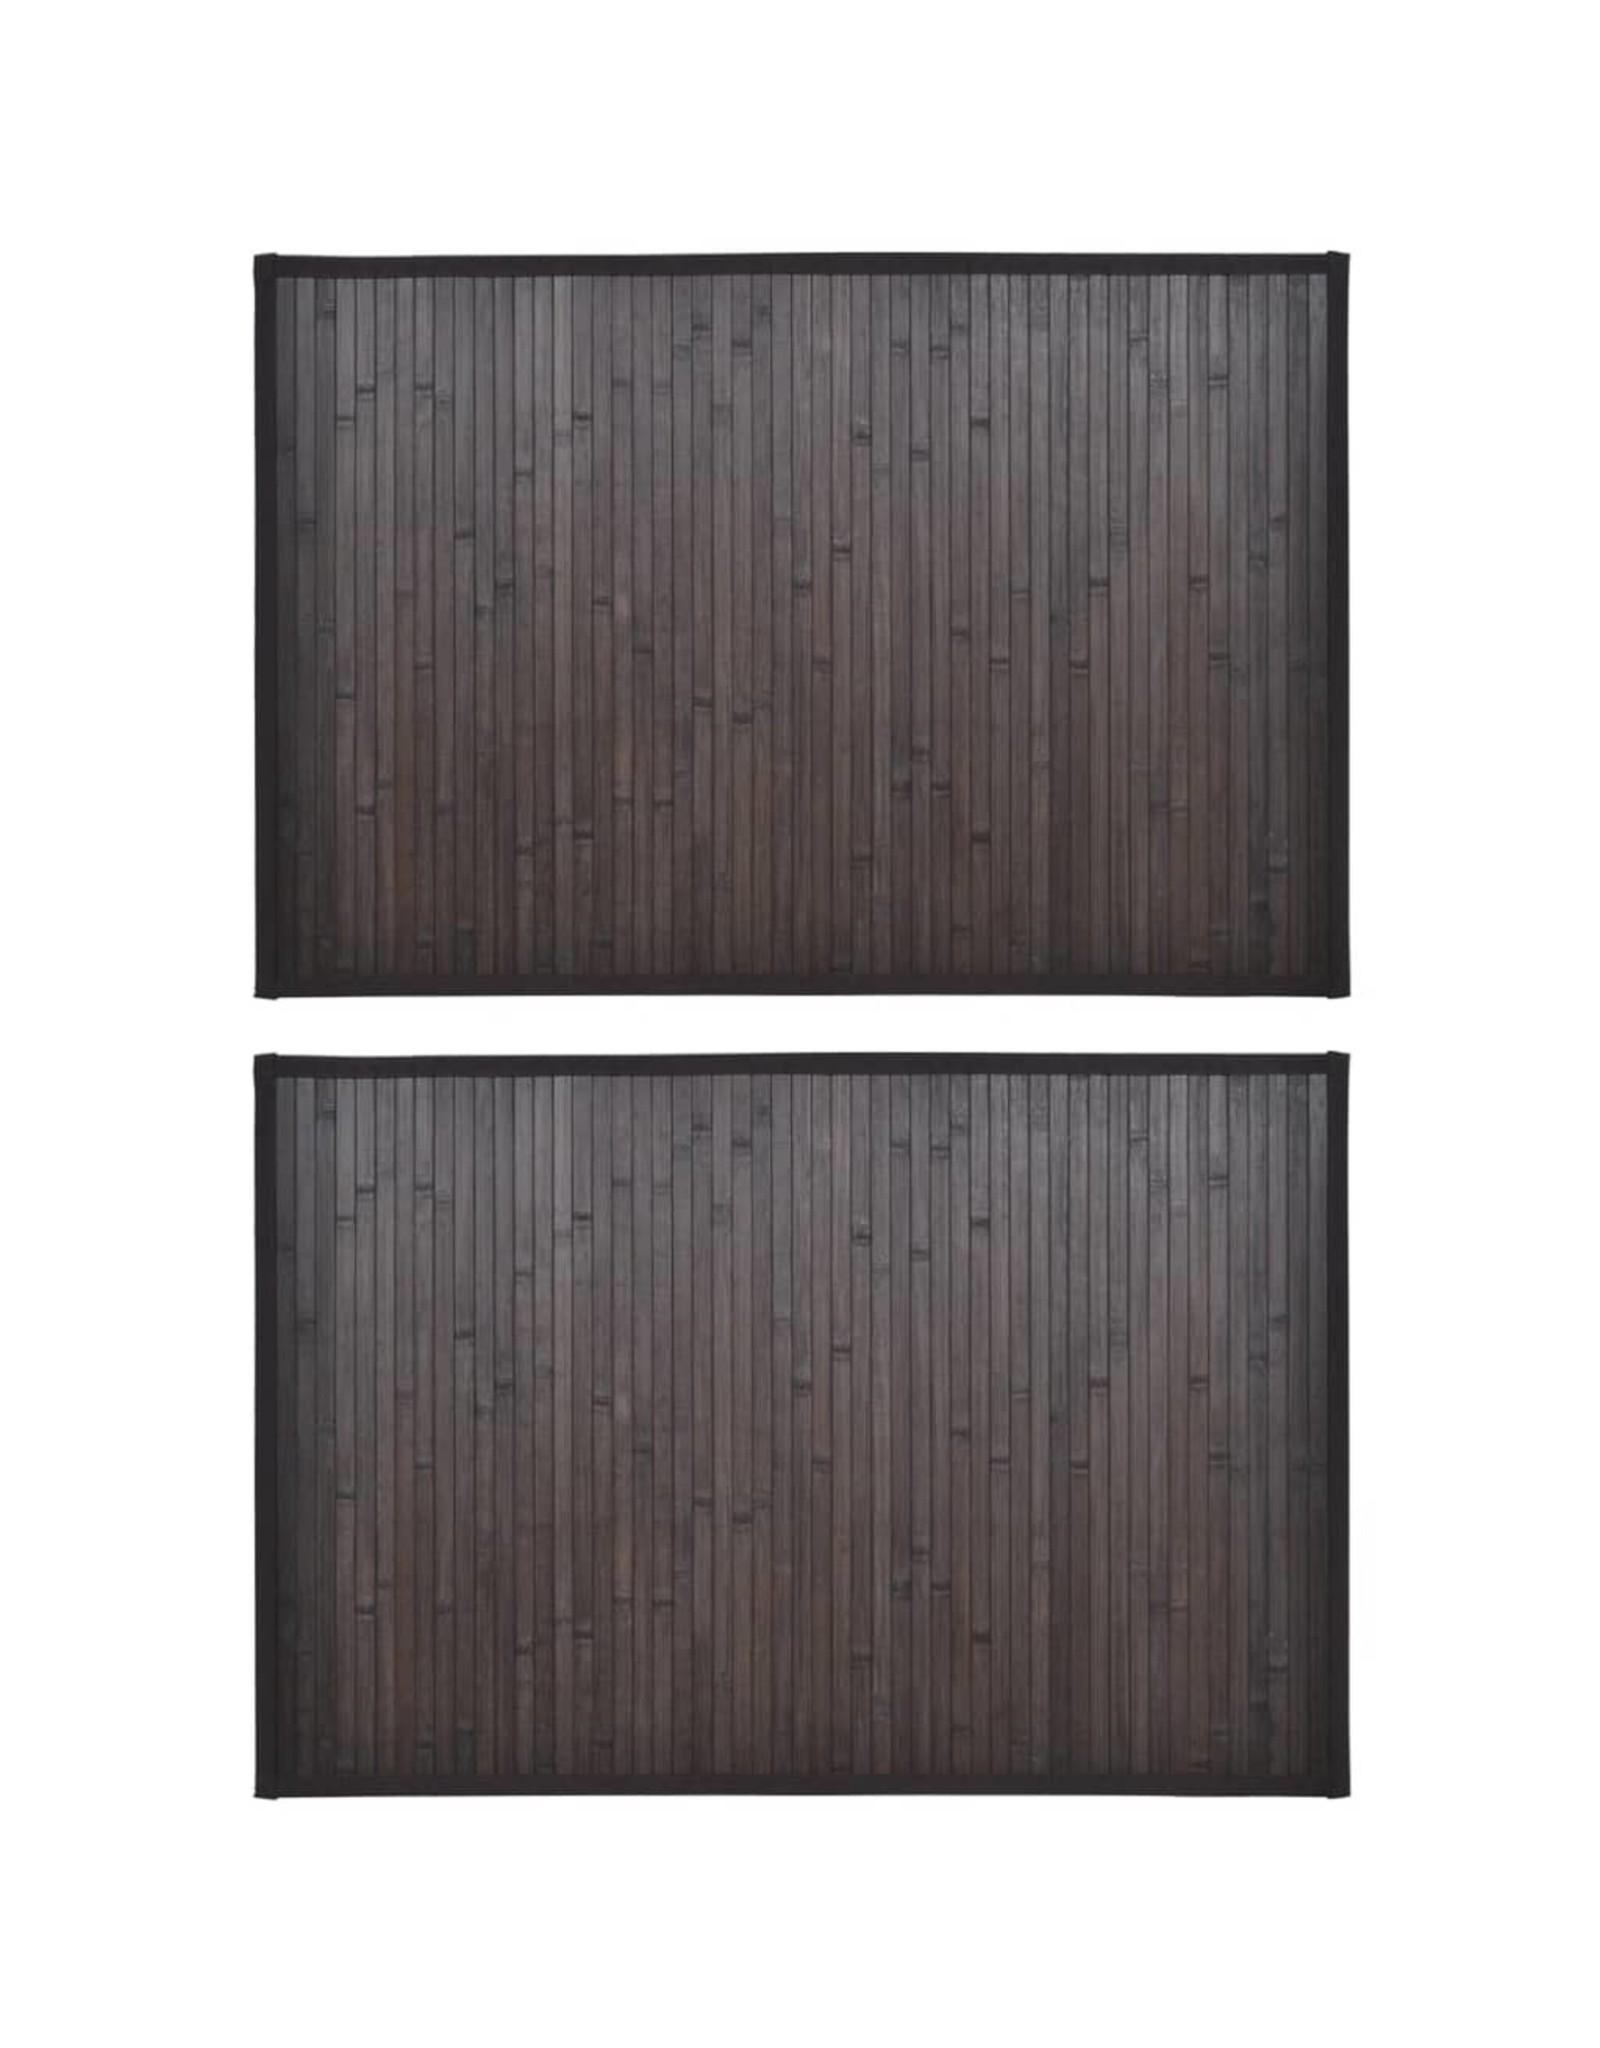 2 Badmatjes bamboe 40 x 50 cm donkerbruin